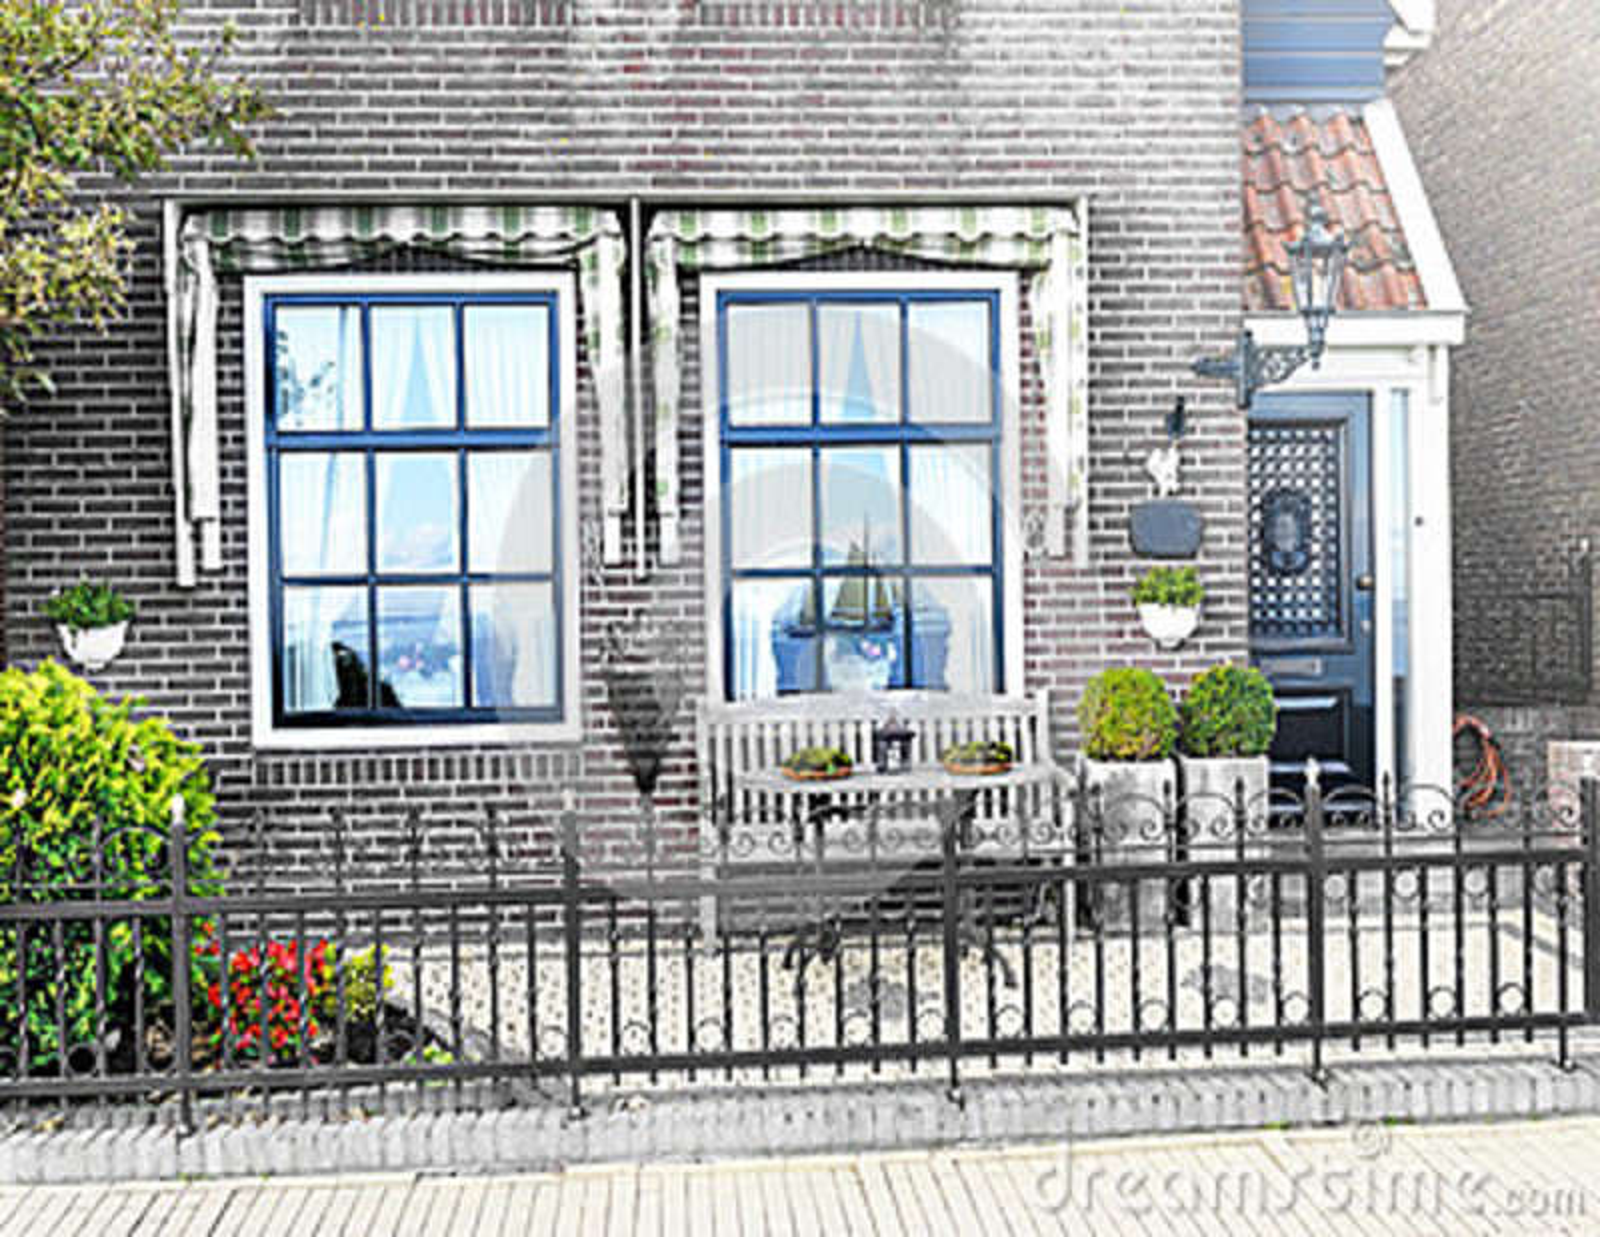 Le Porche D Une Maison le porche d'une maison de campagne photo stock - image du beau, bleu